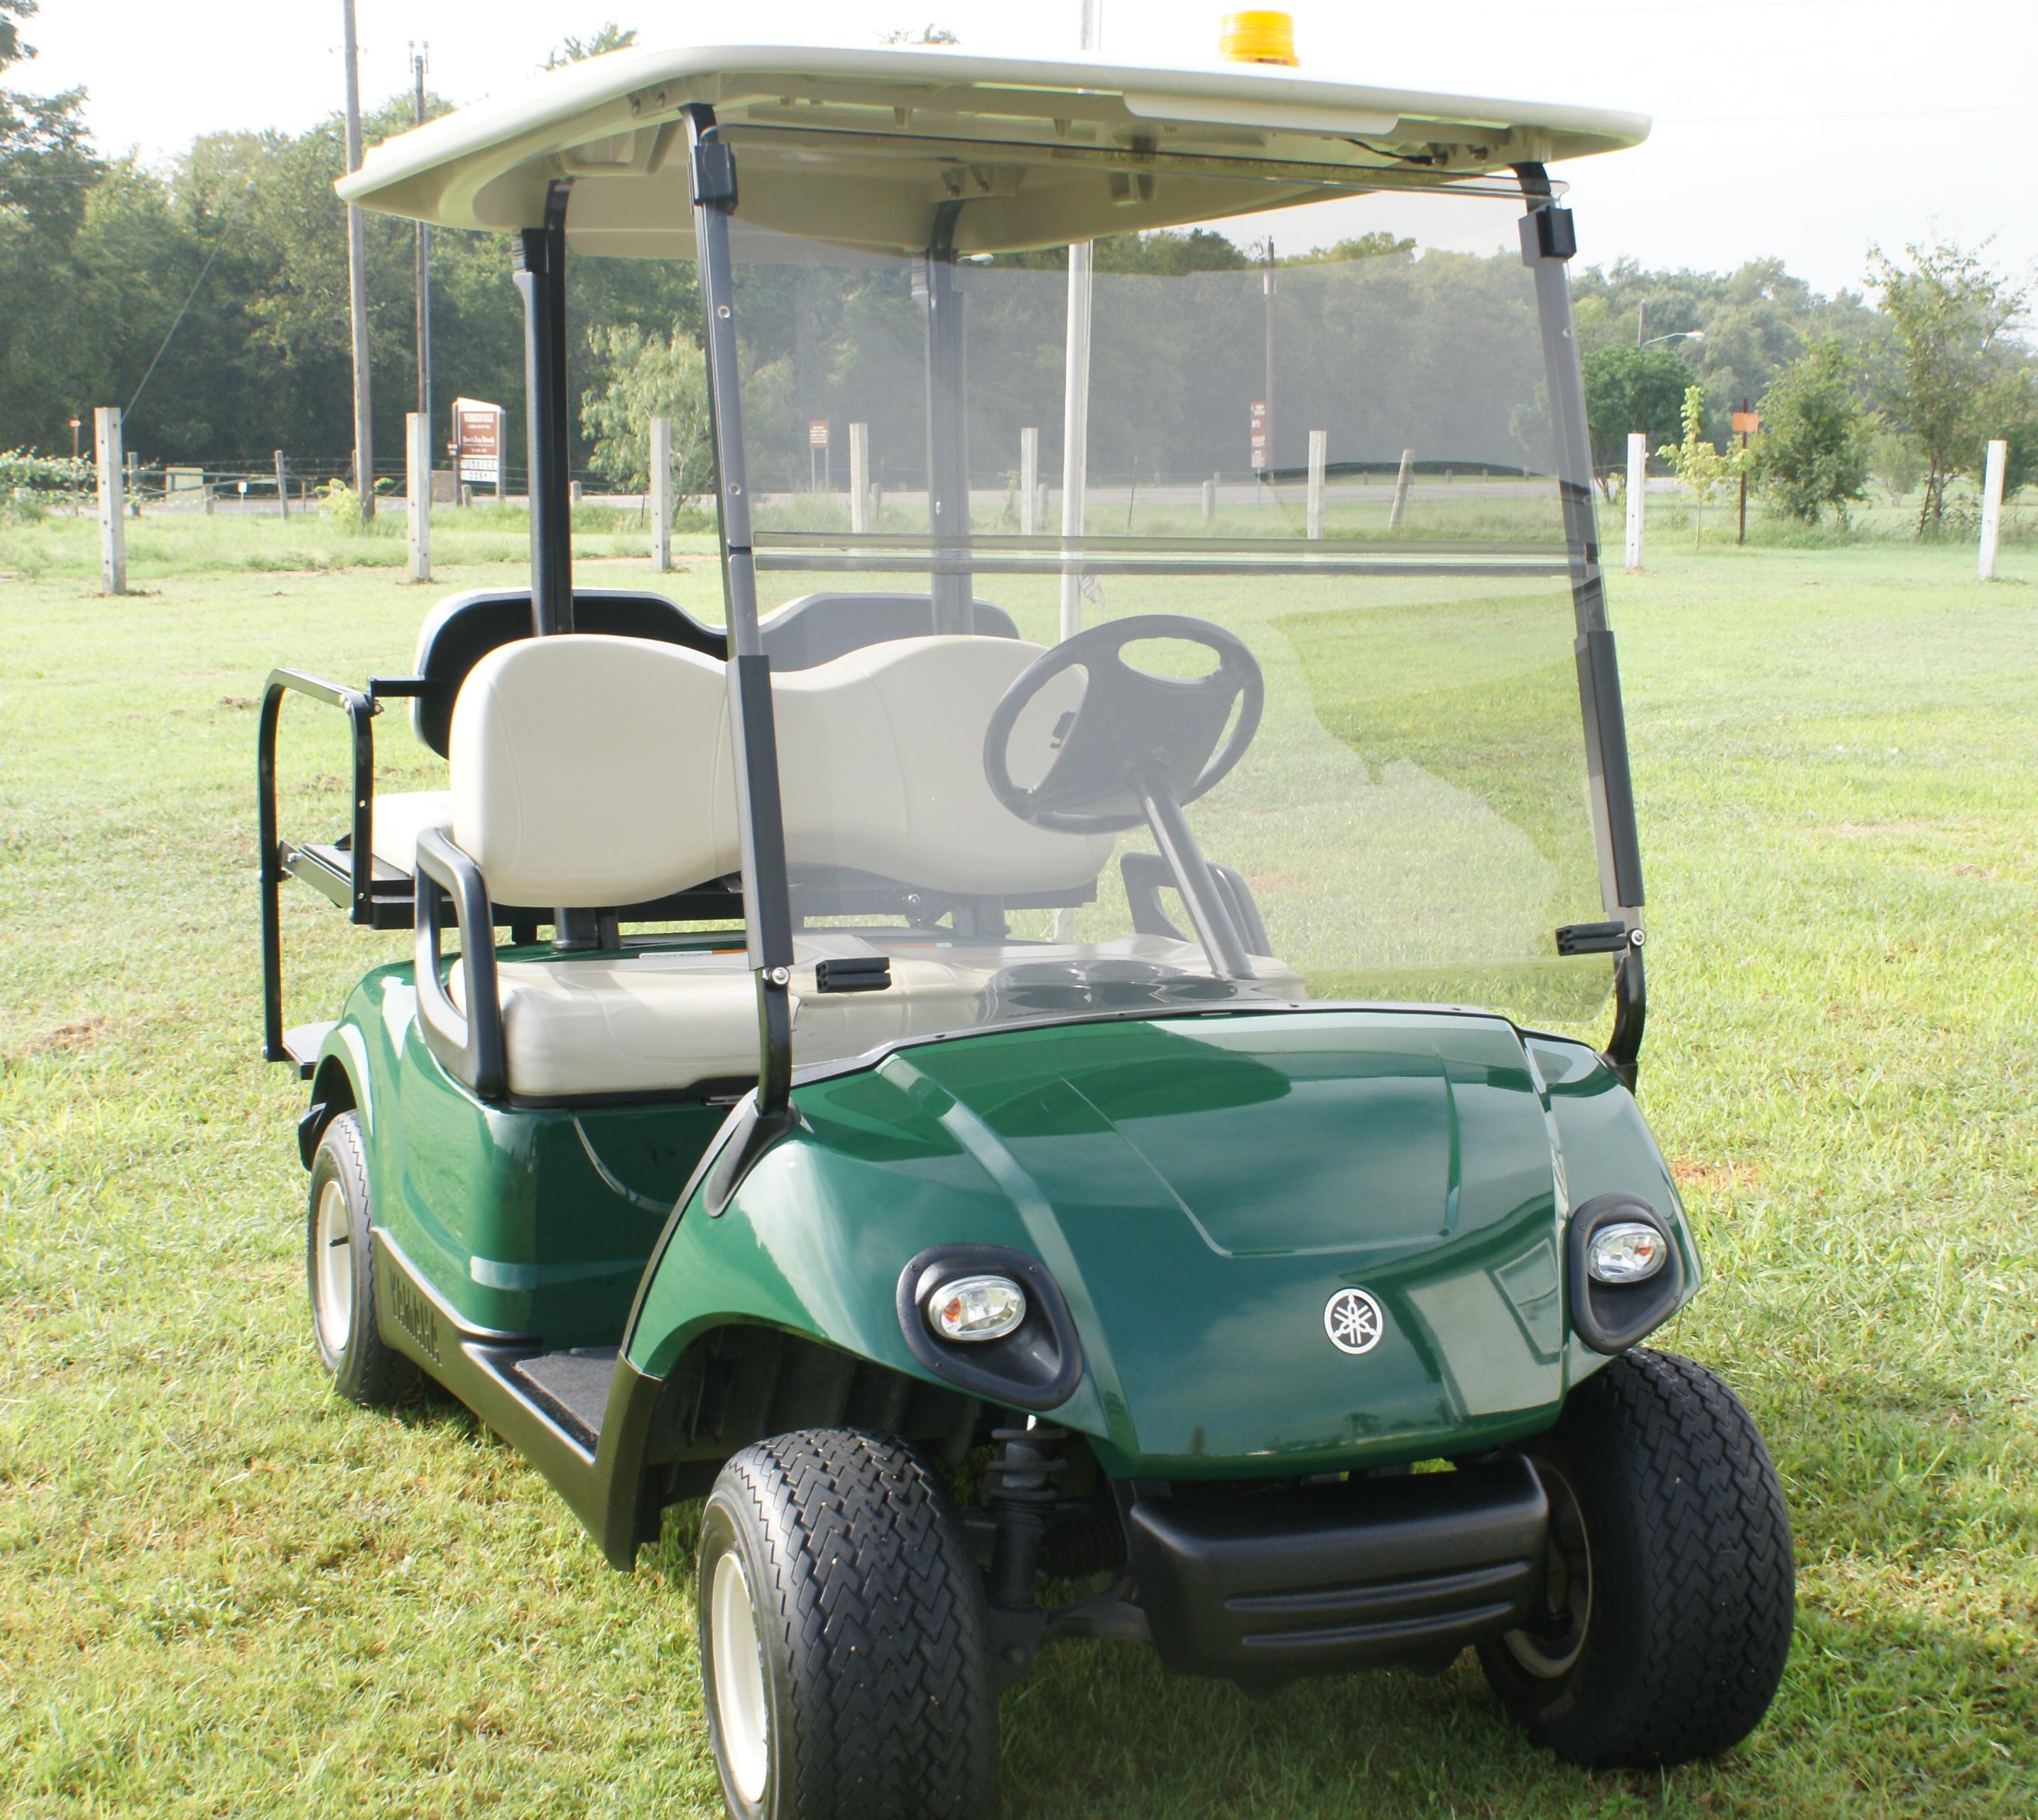 Jdk golf cart sales rentals 2001 post oak rd for Narrow golf cart